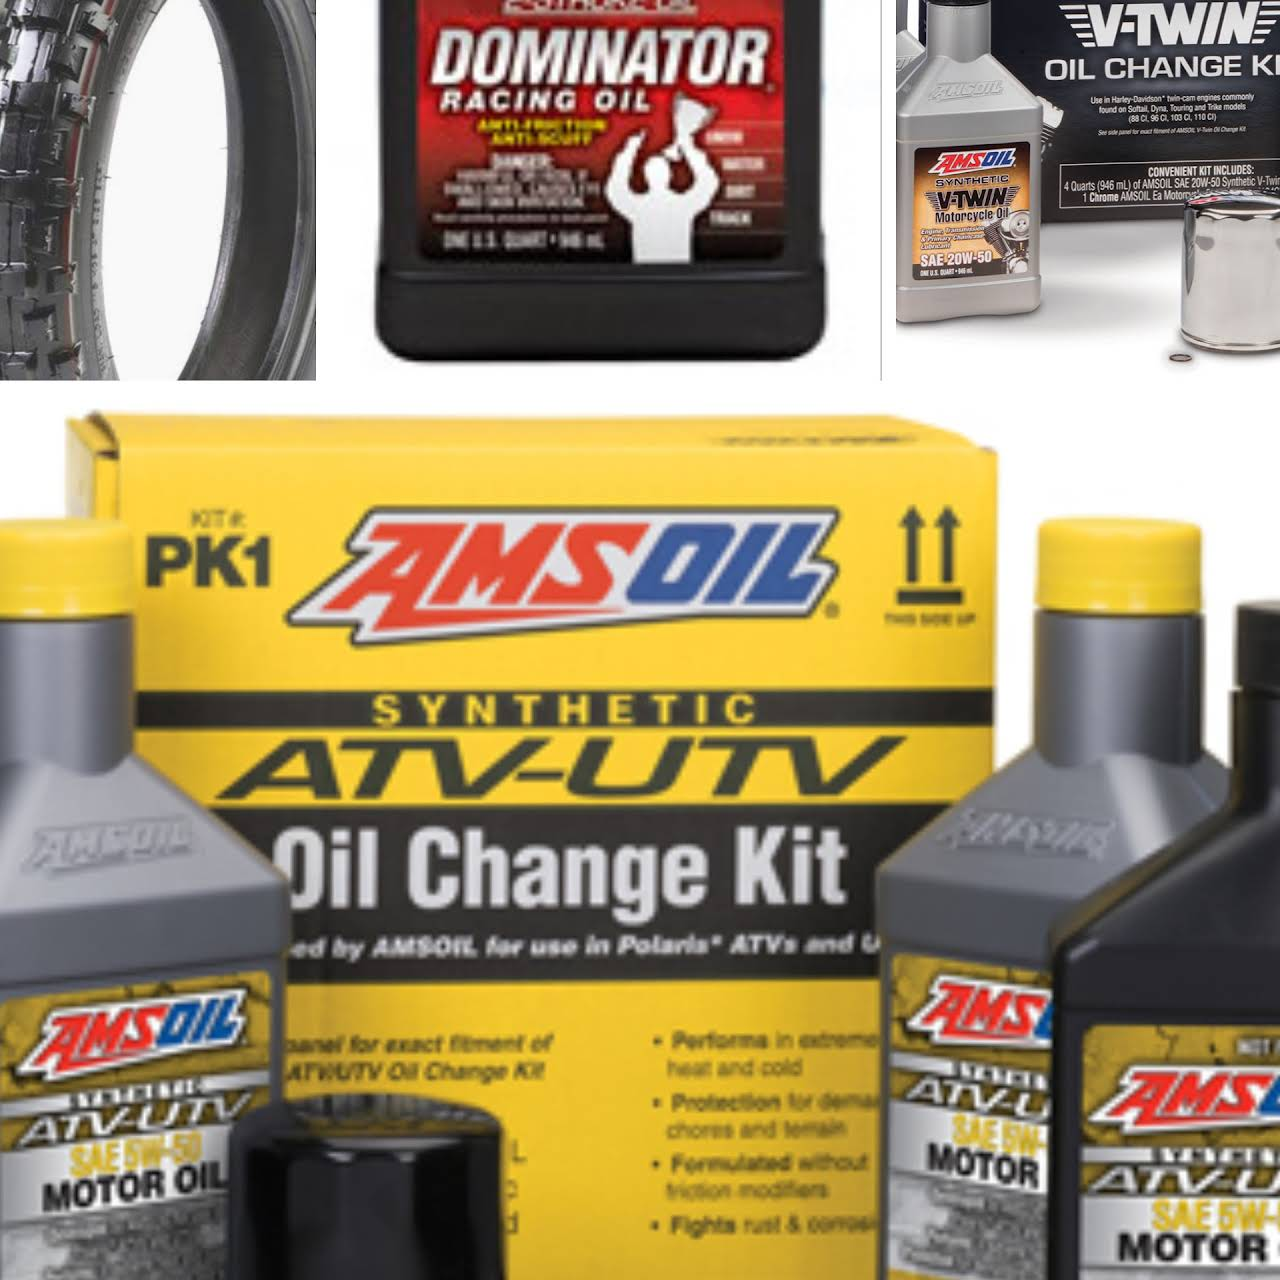 True Performance Racing - Motorcycle and Powersports Repair Shop in